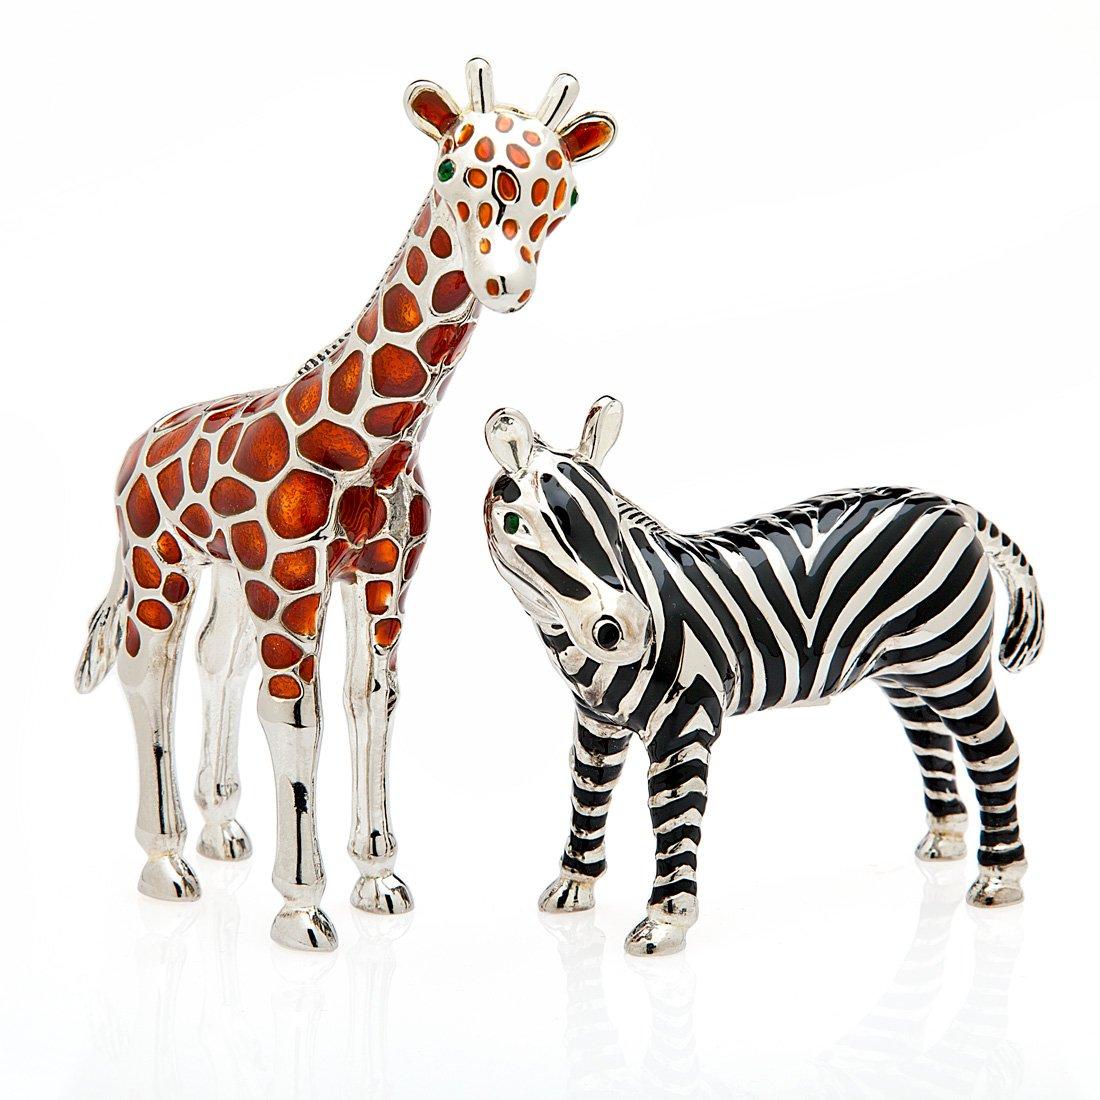 2 Piece Giraffe and Zebra Shaker Set